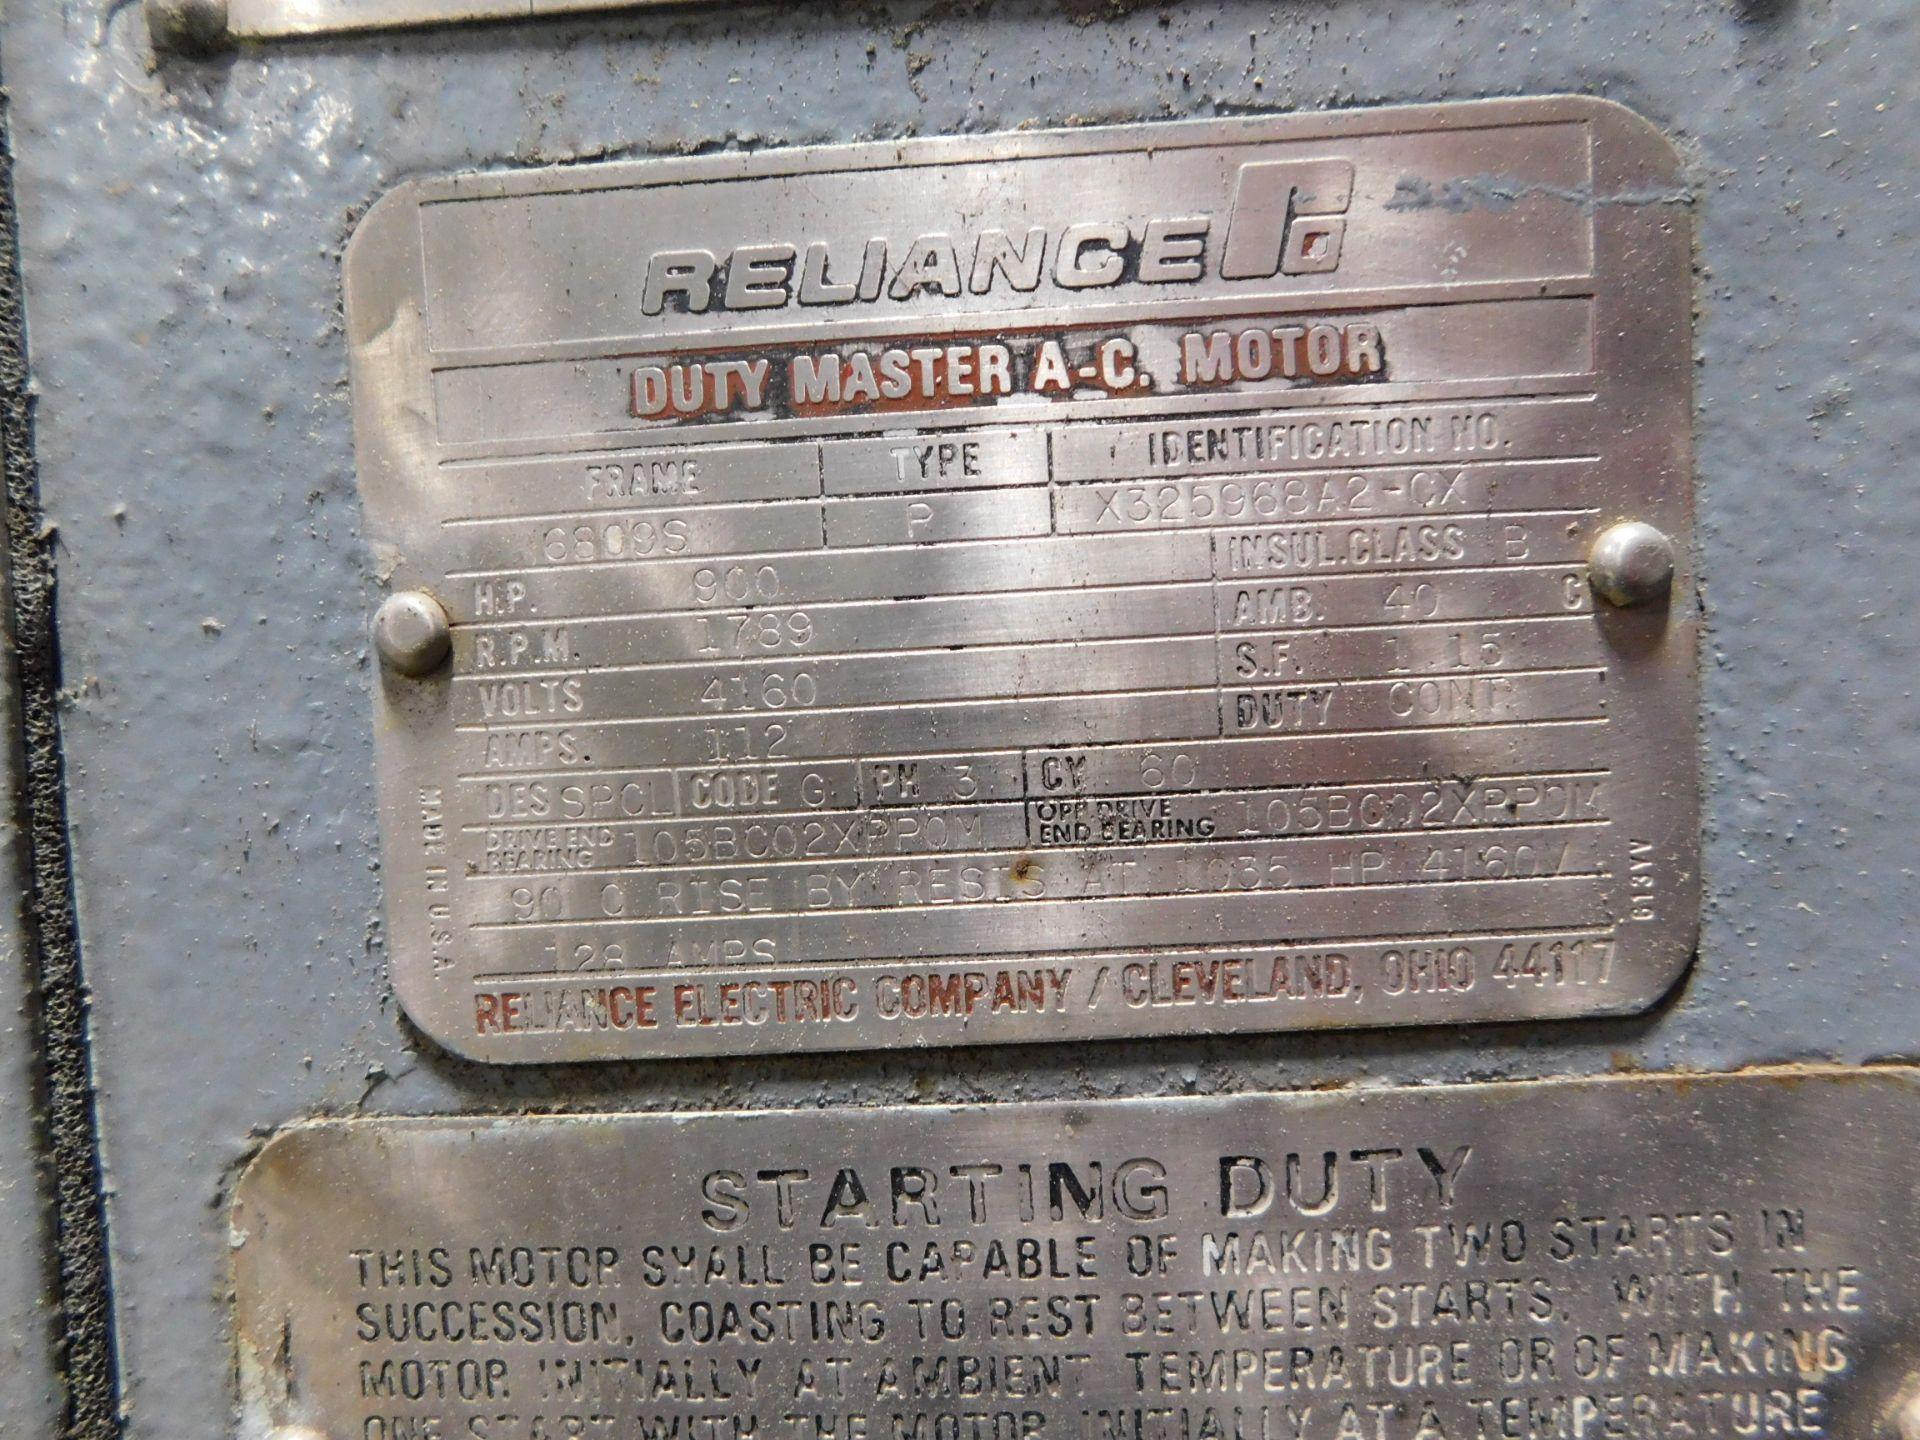 Reliance AC Duty Master Motor. 900 HP. 3 Ph. 60 Hz. 4160 V. 1789 RPM. 6809S. Type P. - Image 5 of 8